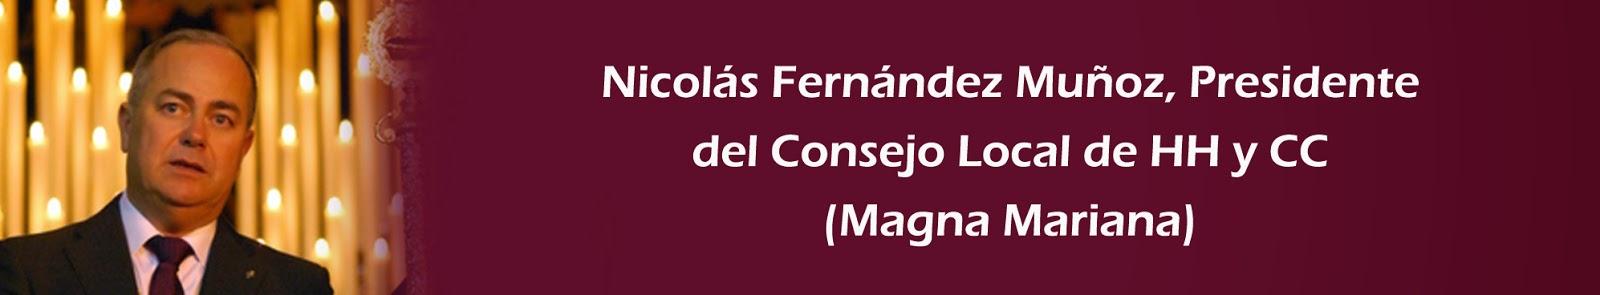 http://pasionygloriasdeconil.blogspot.com.es/2013/07/entrevista-d-nicolas-fernandez.html